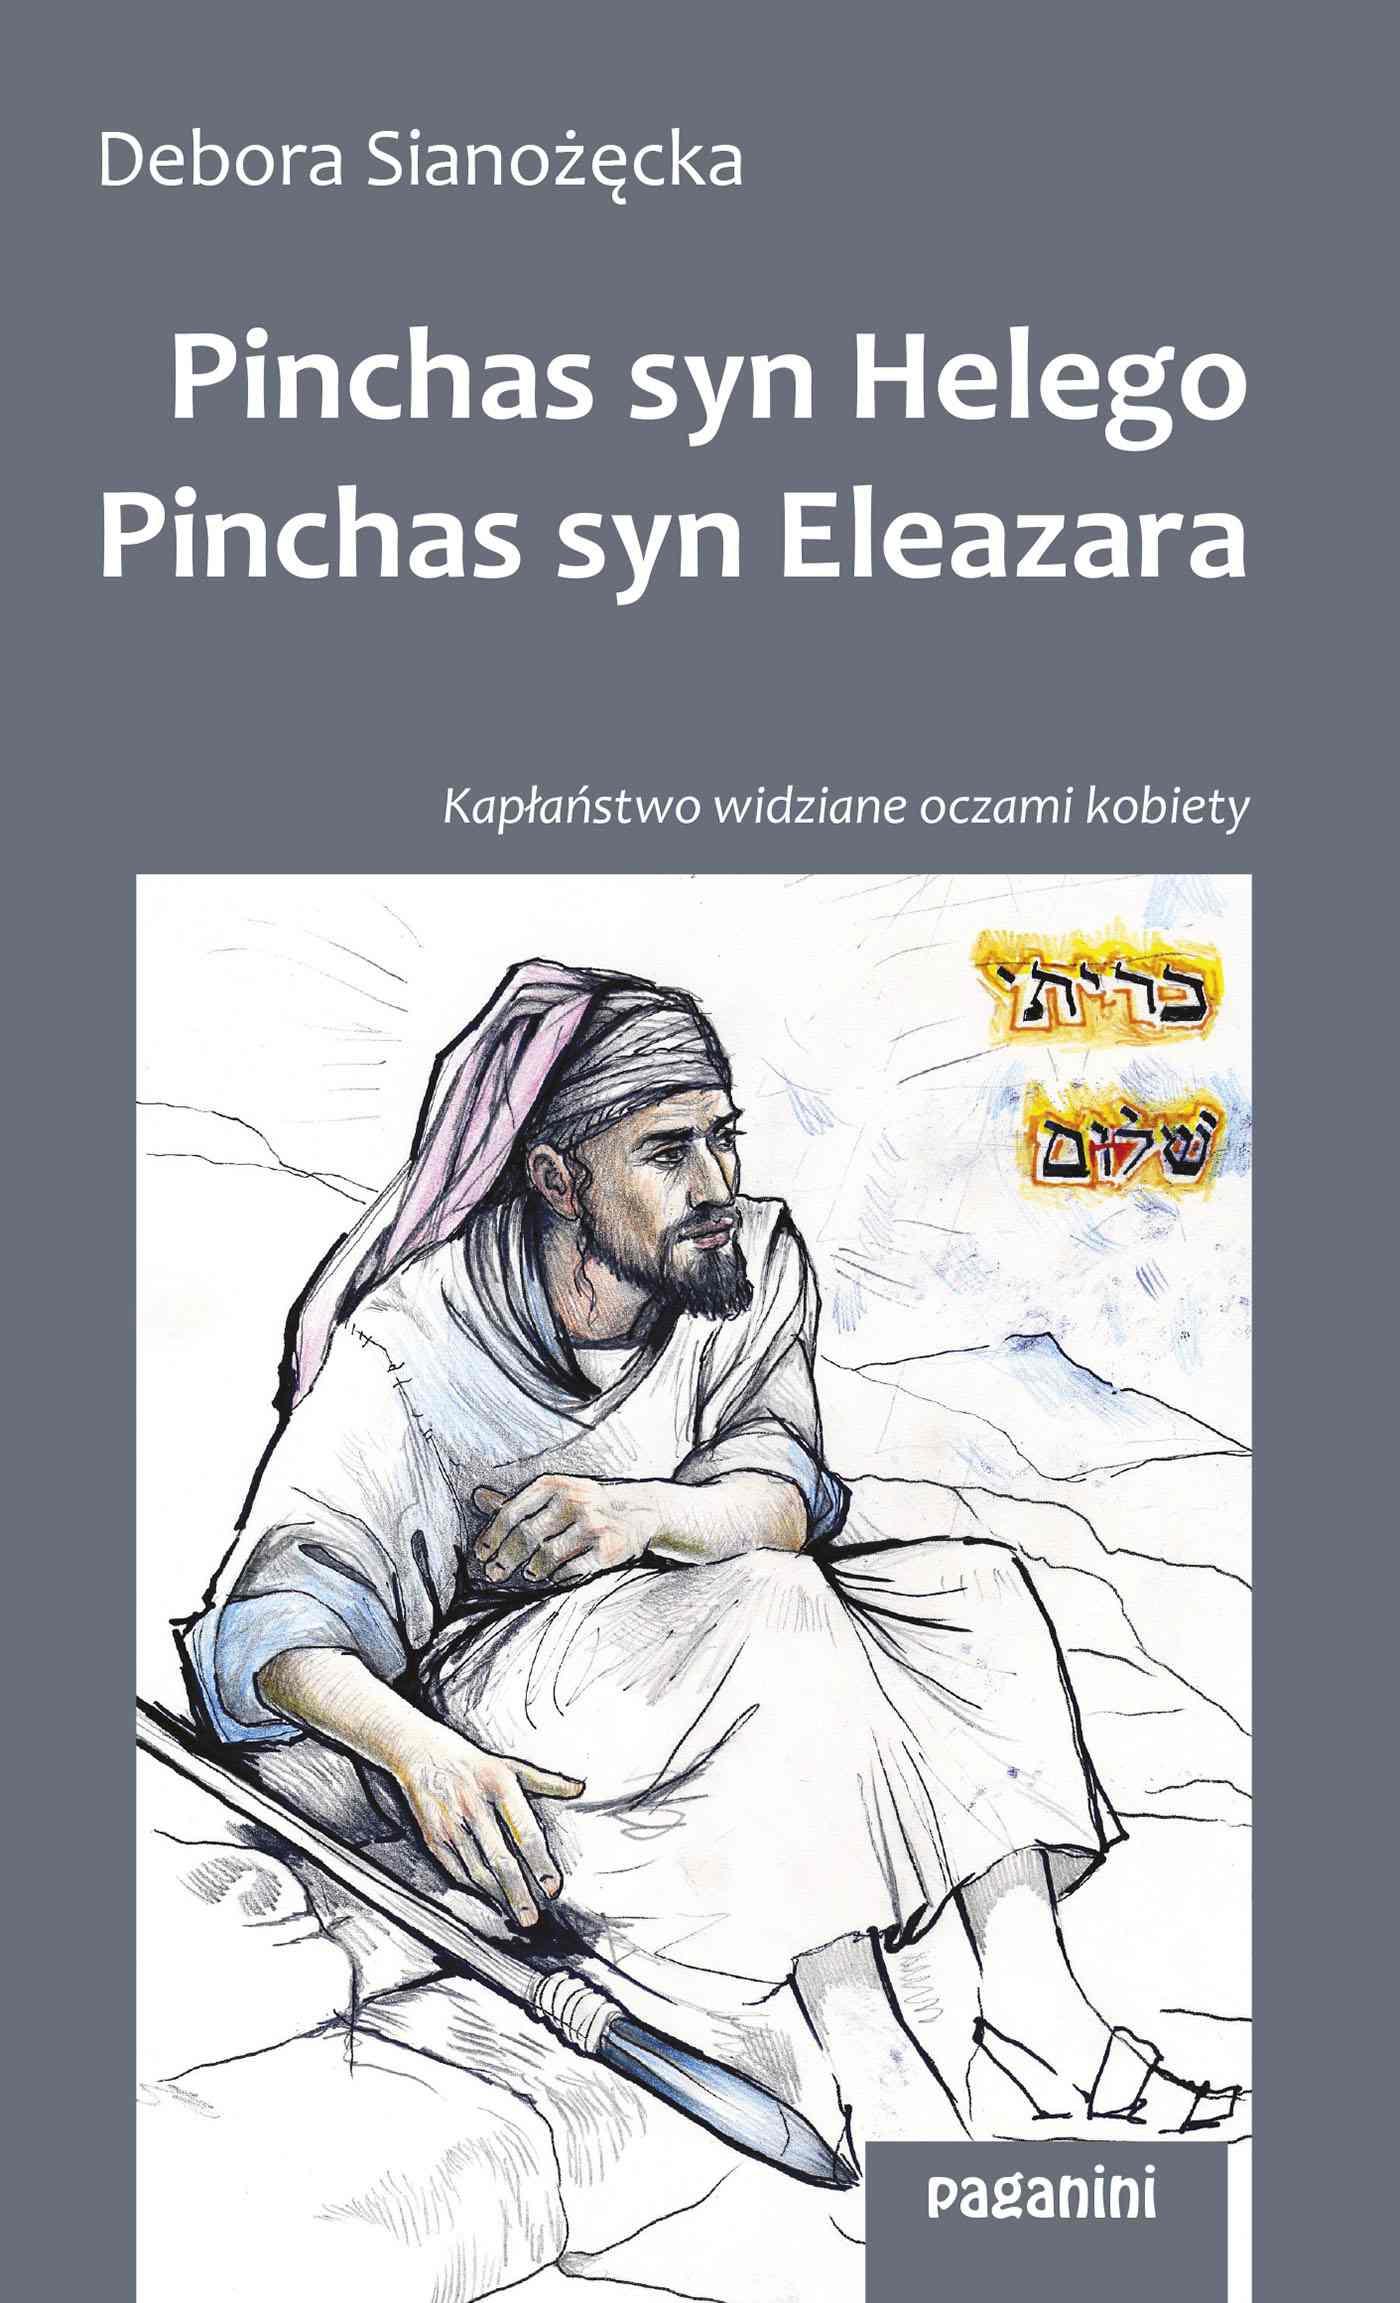 Pinchas, syn Helego Pinchas, syn Eleazara - Ebook (Książka EPUB) do pobrania w formacie EPUB